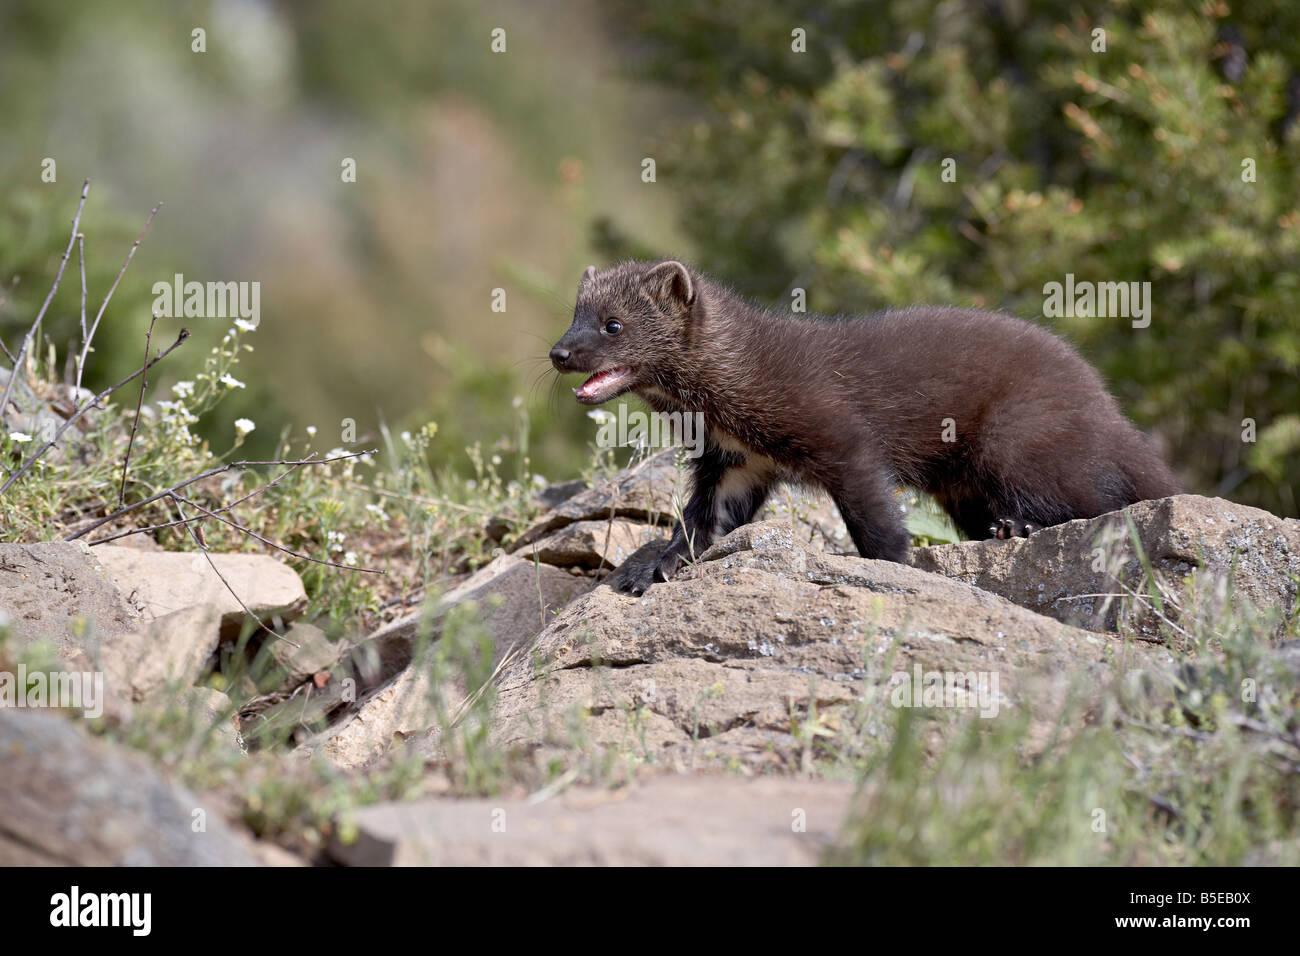 Bébé le pékan (Martes pennanti) en captivité, les animaux du Montana, Bozeman, Montana, USA, Photo Stock